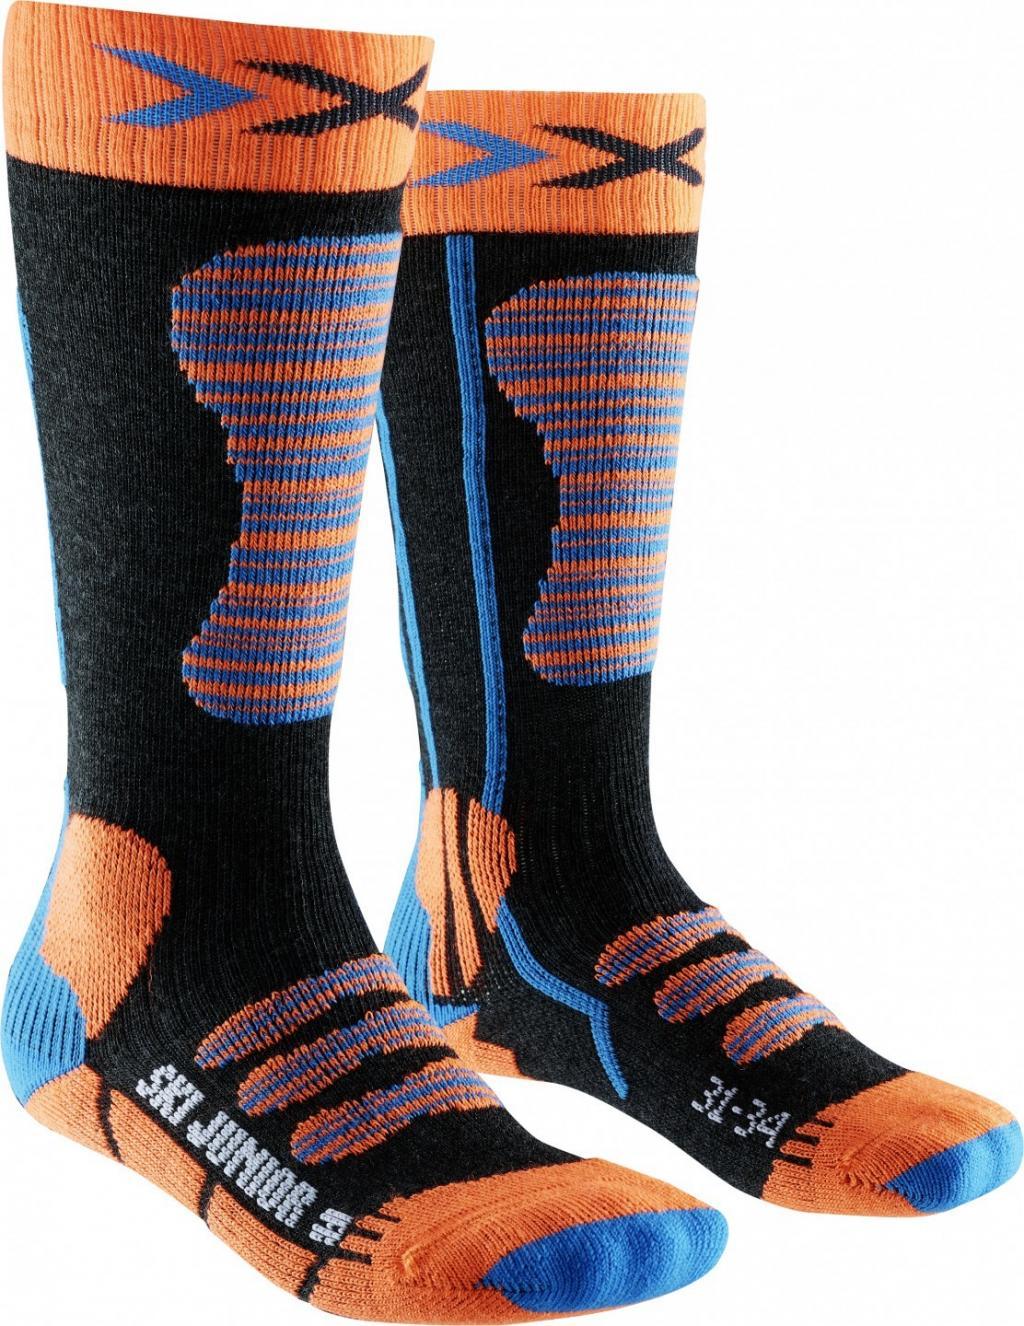 X-Socks Skisocken SKI JUNIOR blau/orange